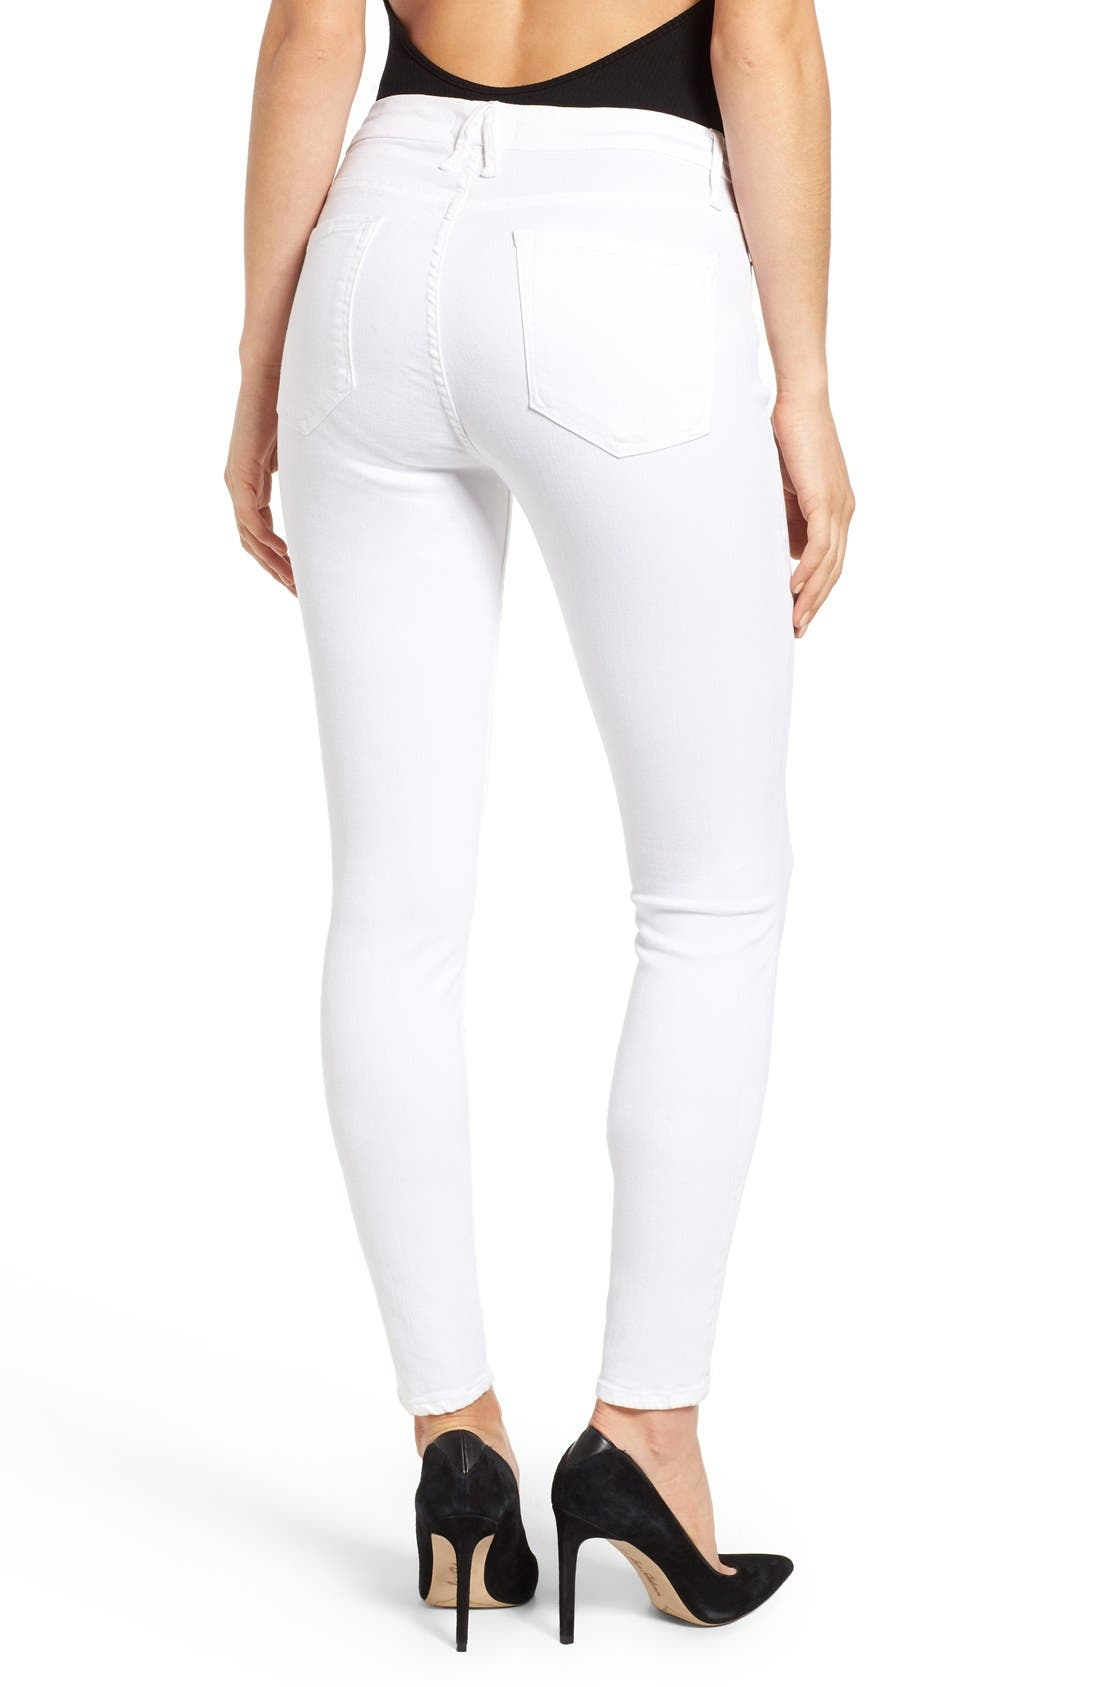 Alternate Image 2  - Good American Good Legs High Rise Skinny Jeans